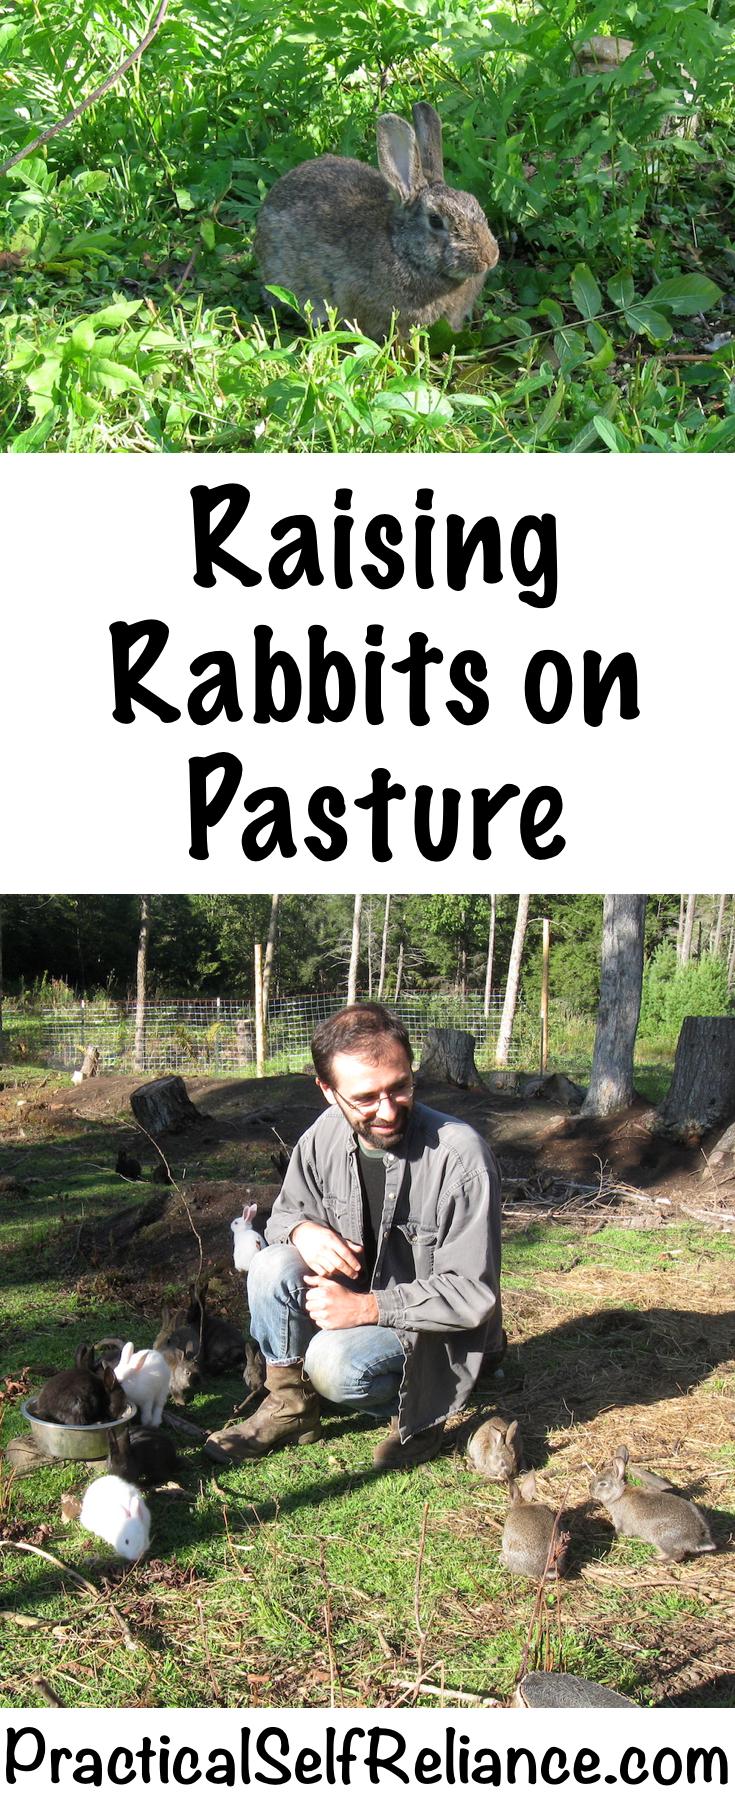 Raising Rabbits on Pasture #rabbits #raisingrabbits #pastureraised #permaculture  #homestead #homesteading #selfsufficiency #selfreliant #preparedness